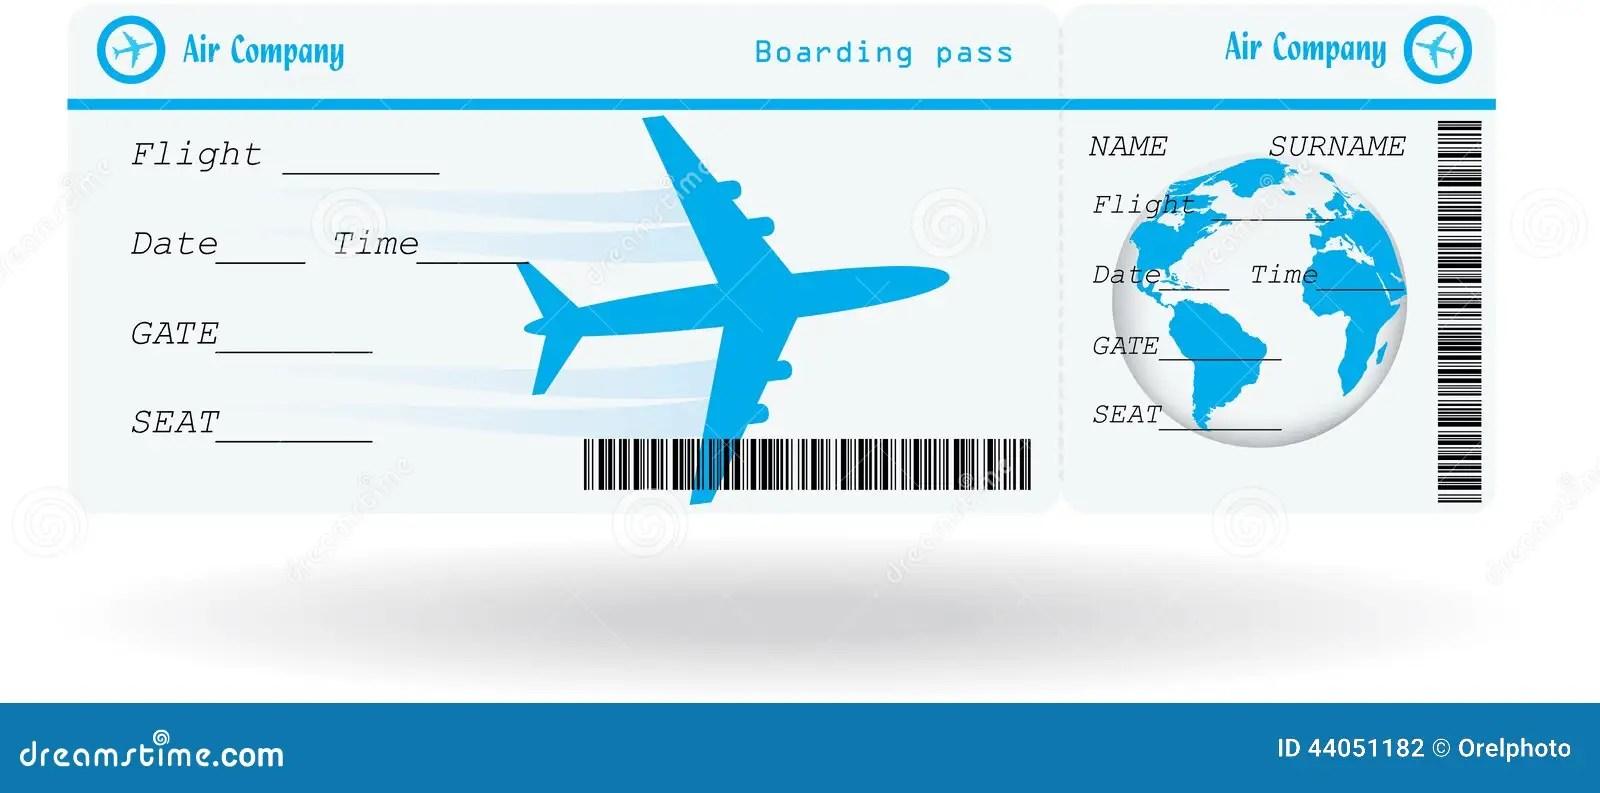 Precios De Boletos De Avion